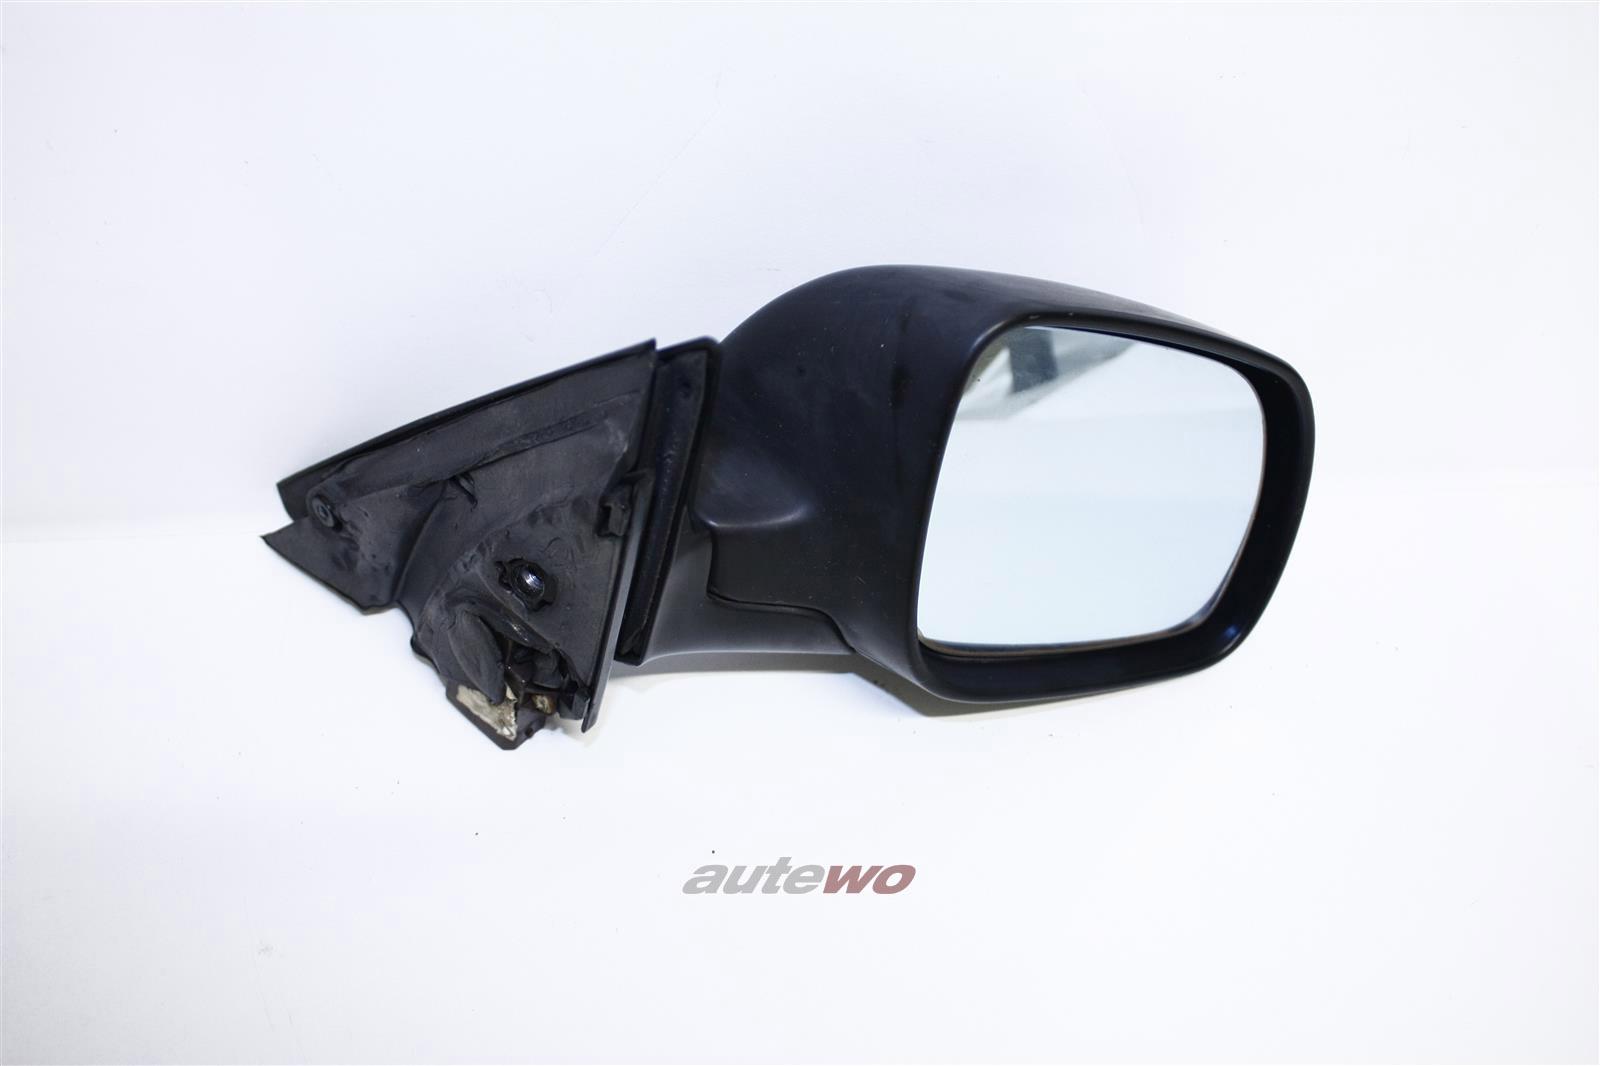 Audi 100/A6 C4 Außenspiegel elektr. verstellb. Rechts unlackiert schwarz 4A1858532